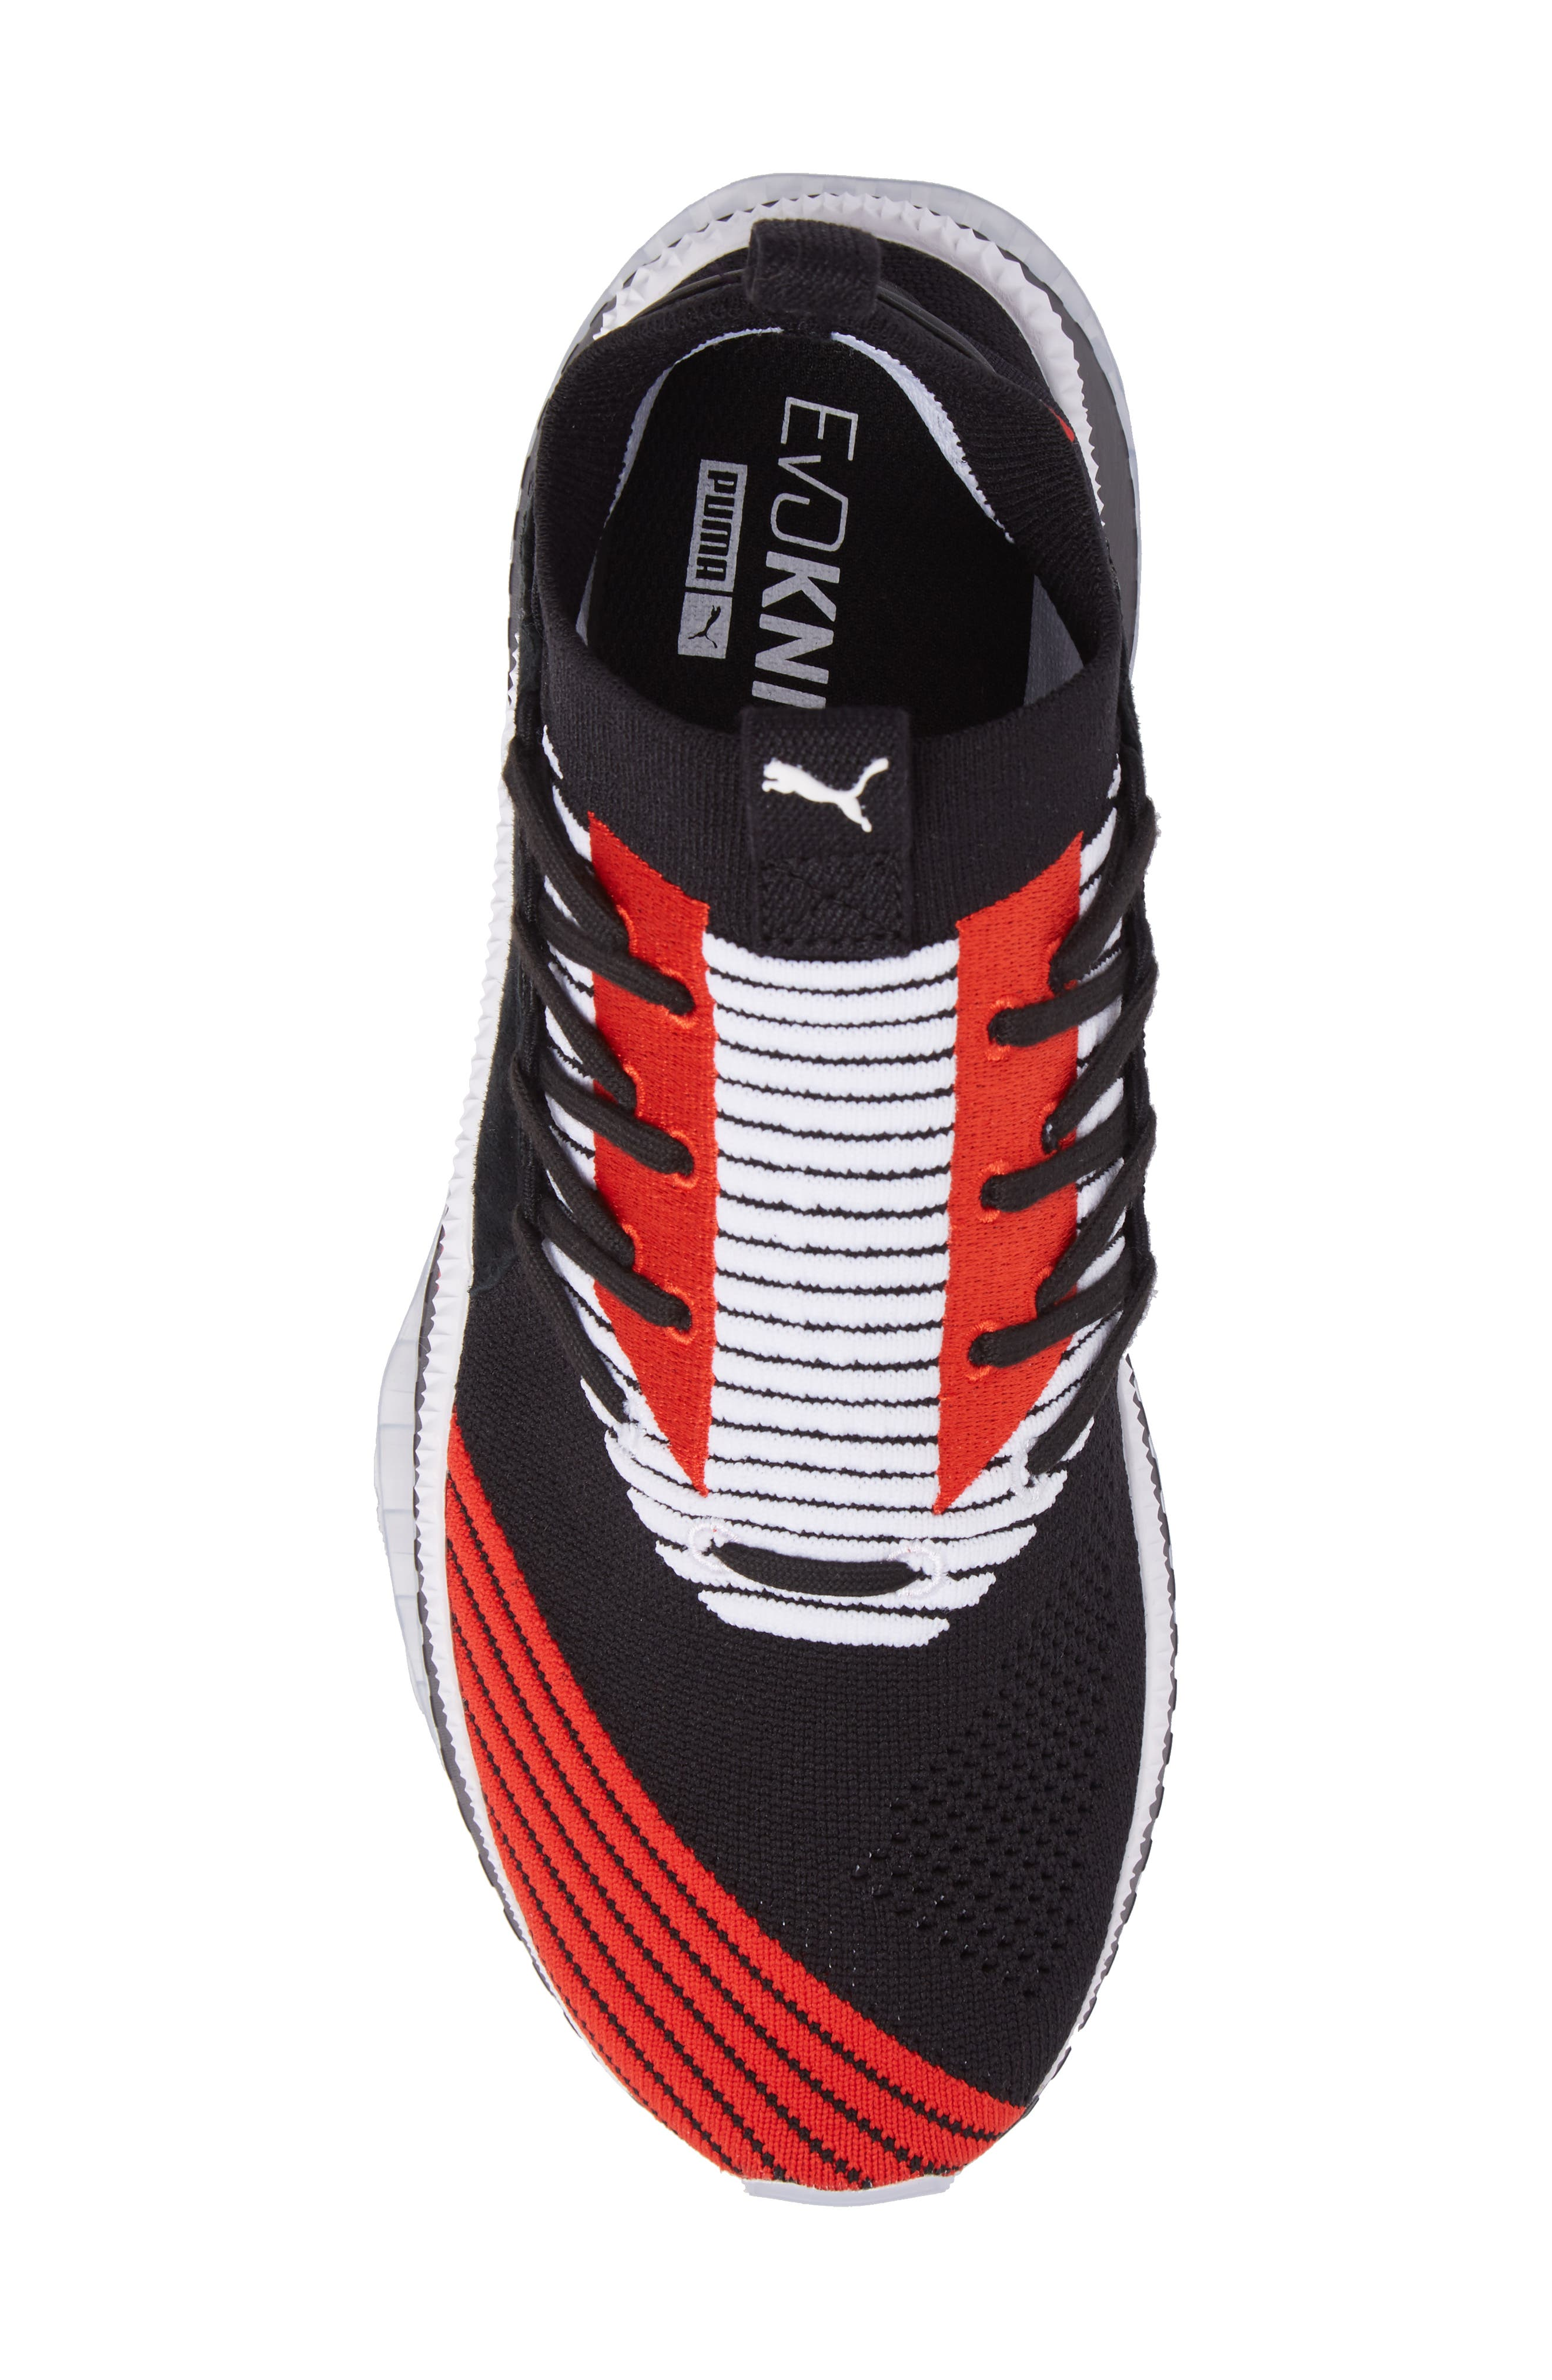 Tsugi Shinsei UT Odyssey Sneaker,                             Alternate thumbnail 5, color,                             Black/White/Flame Scarlet